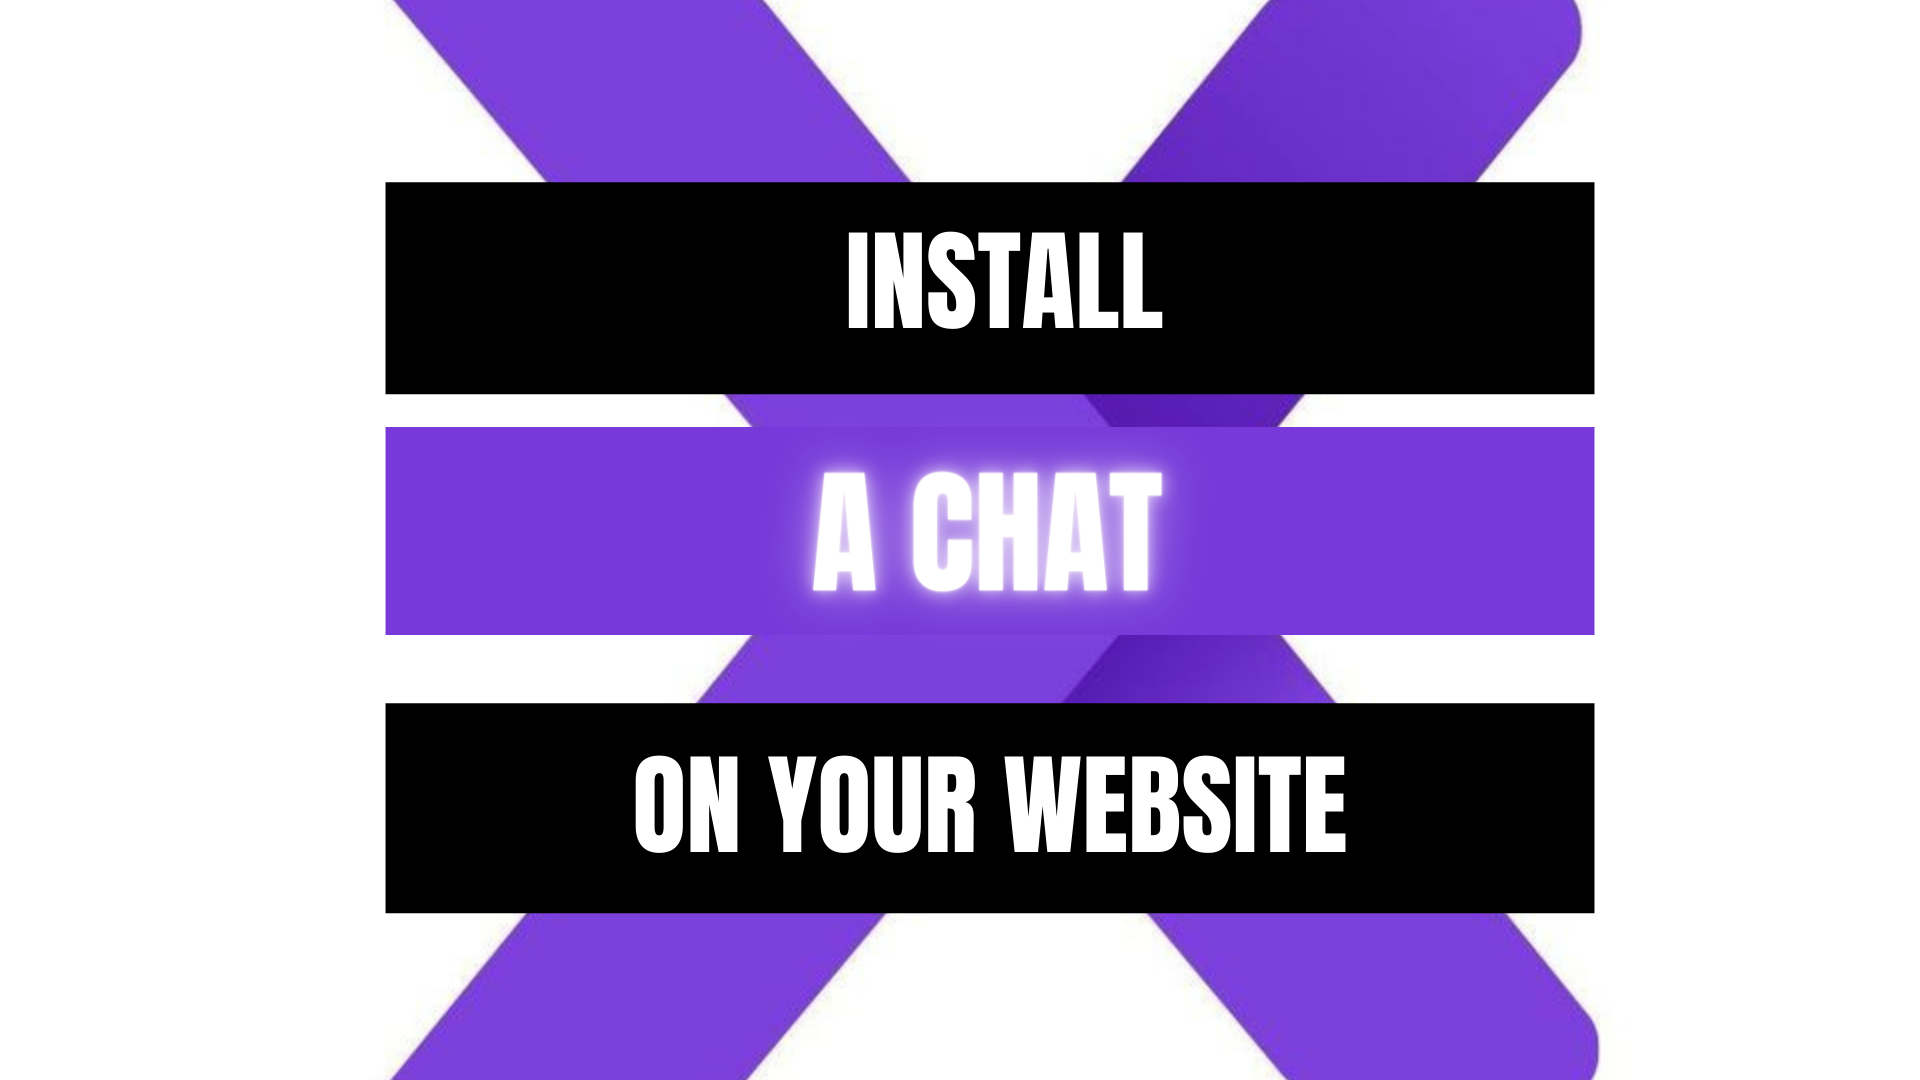 Peekaboox - Install the Tawk.to chatbot on Peekaboox